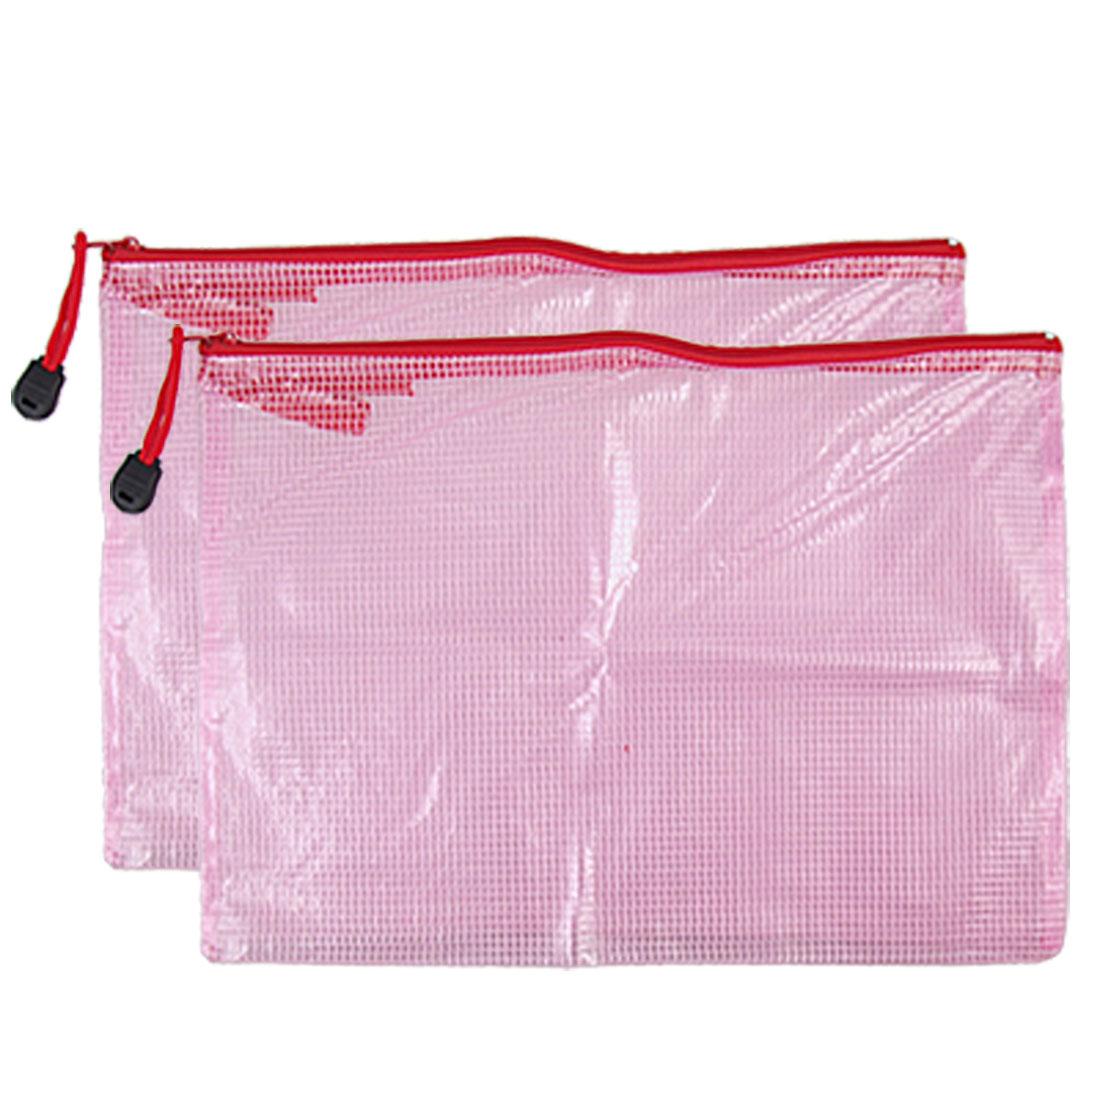 Inner Netty Design Clear Pink B5 Paper Size Flies Bag 2 Pcs